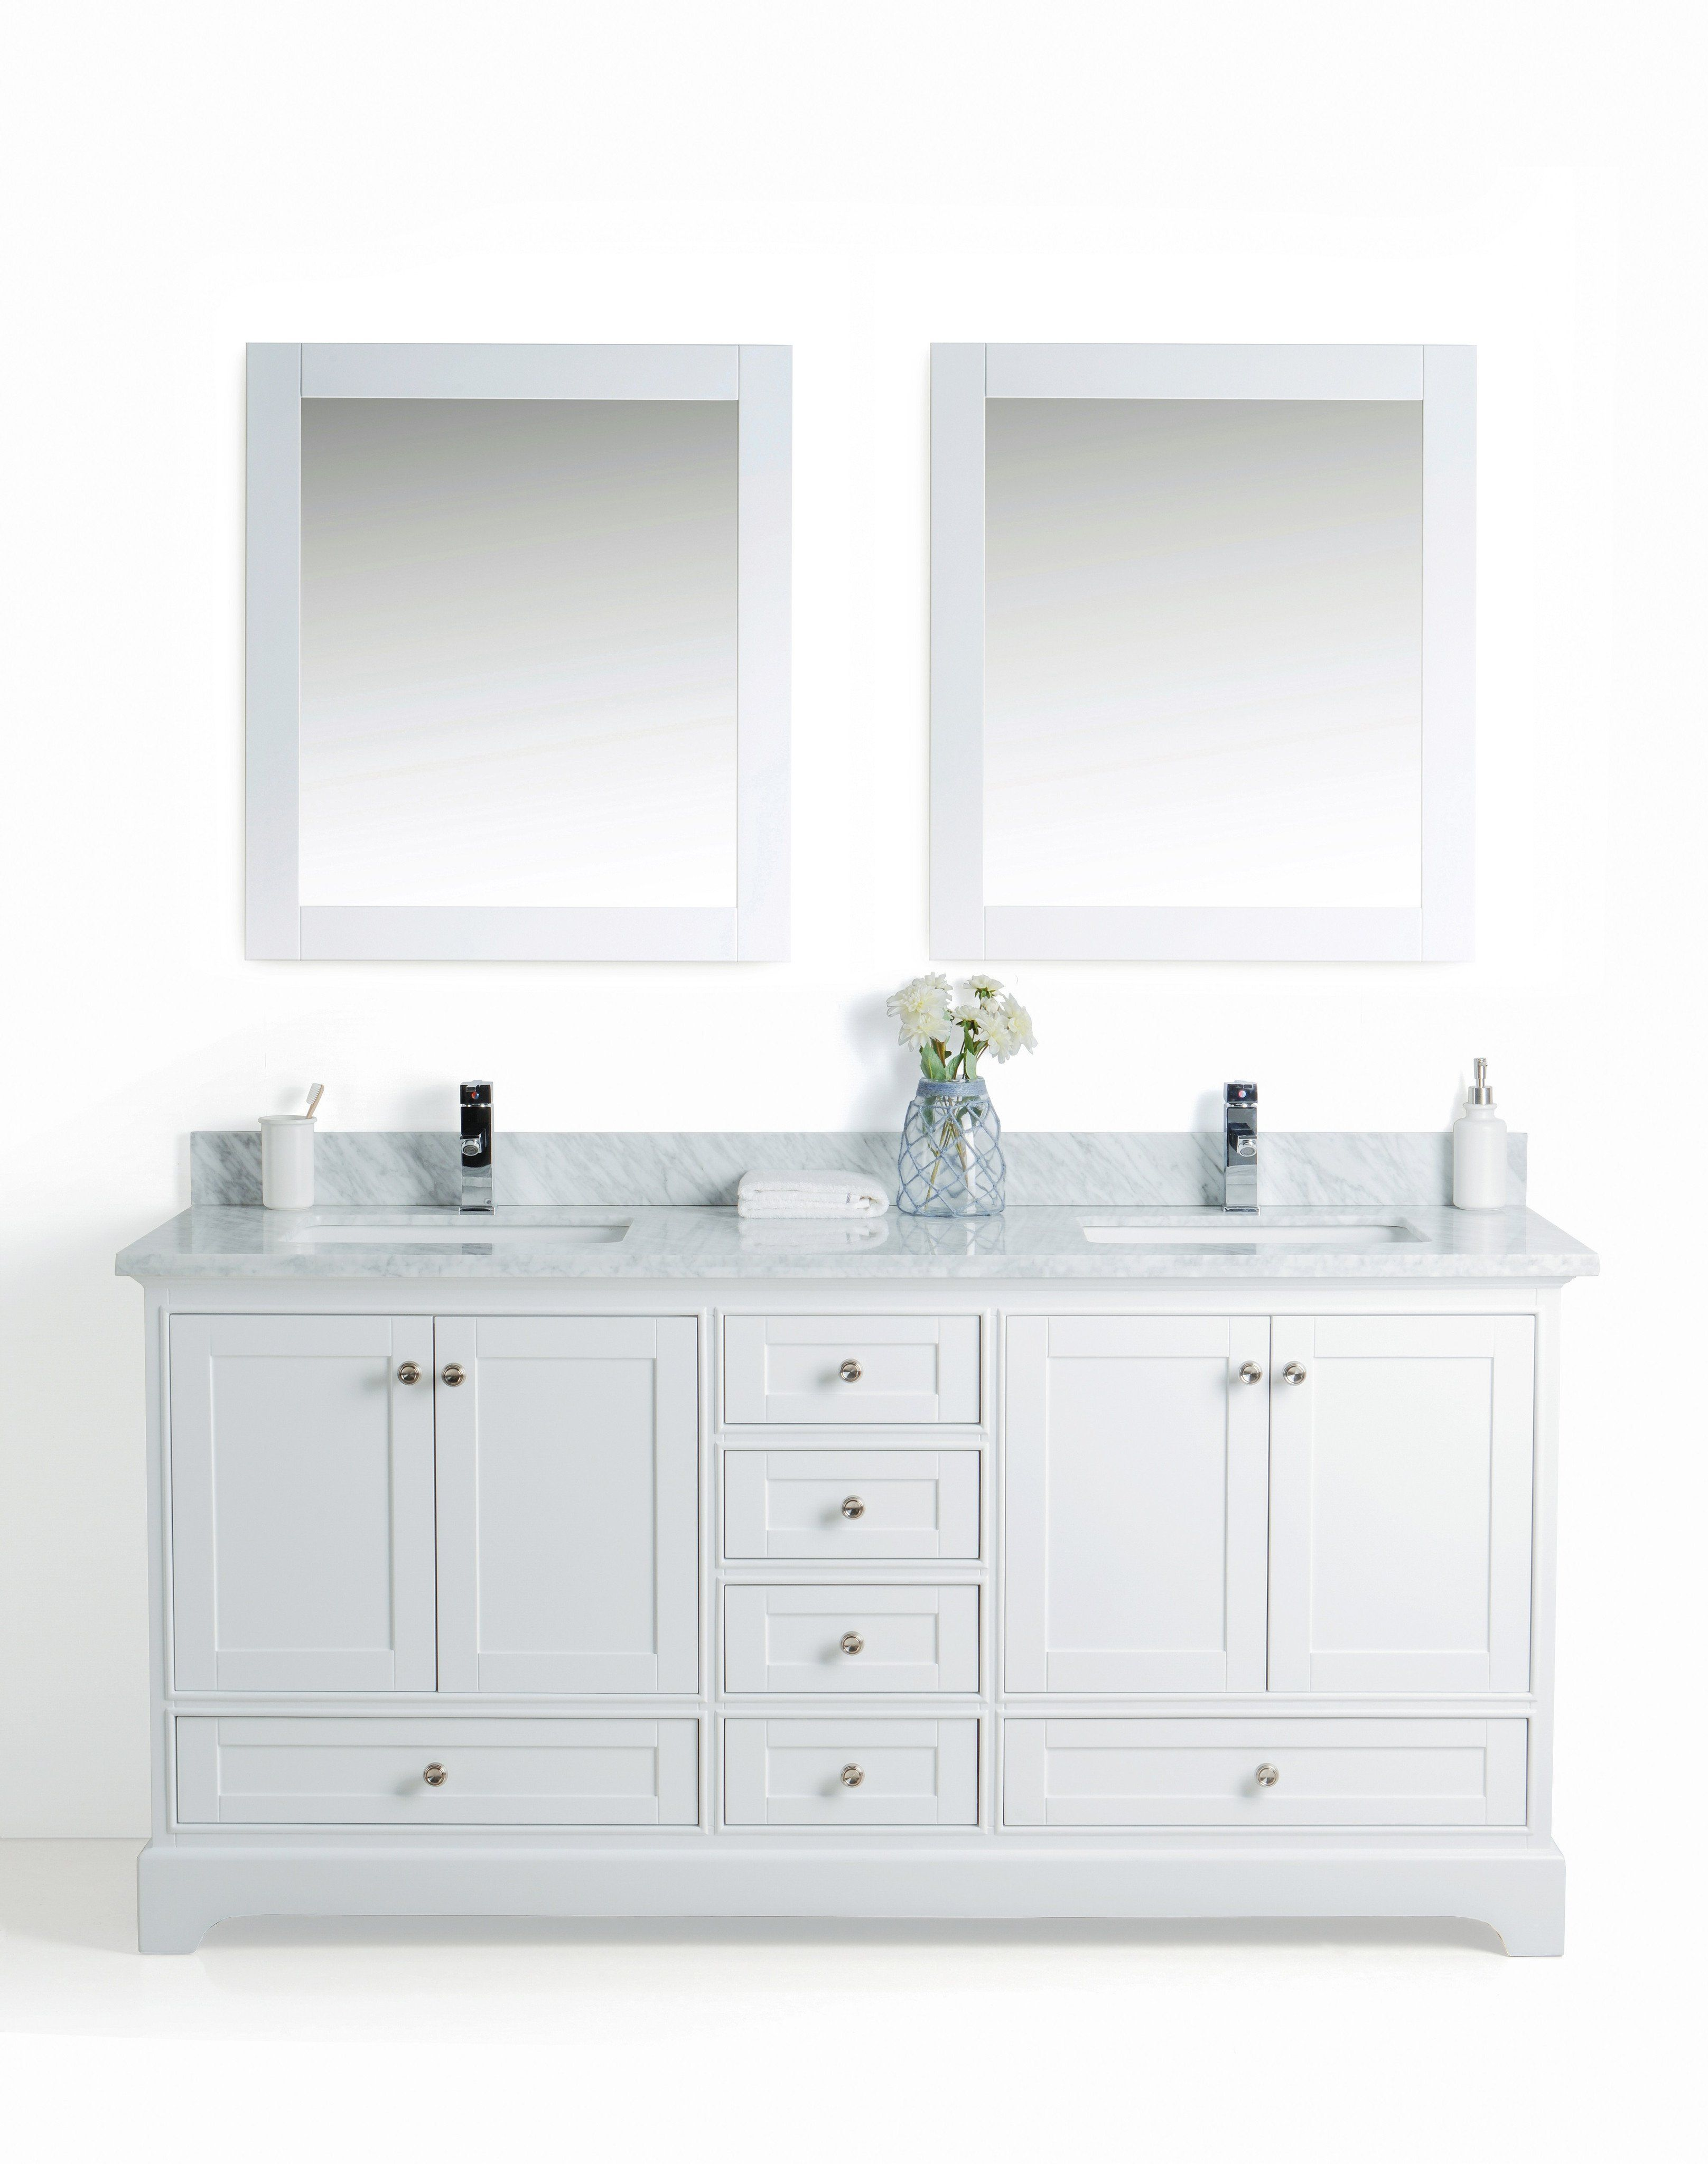 72 Inch Double Sink Bathroom Vanity with Carrara Marble Top ...